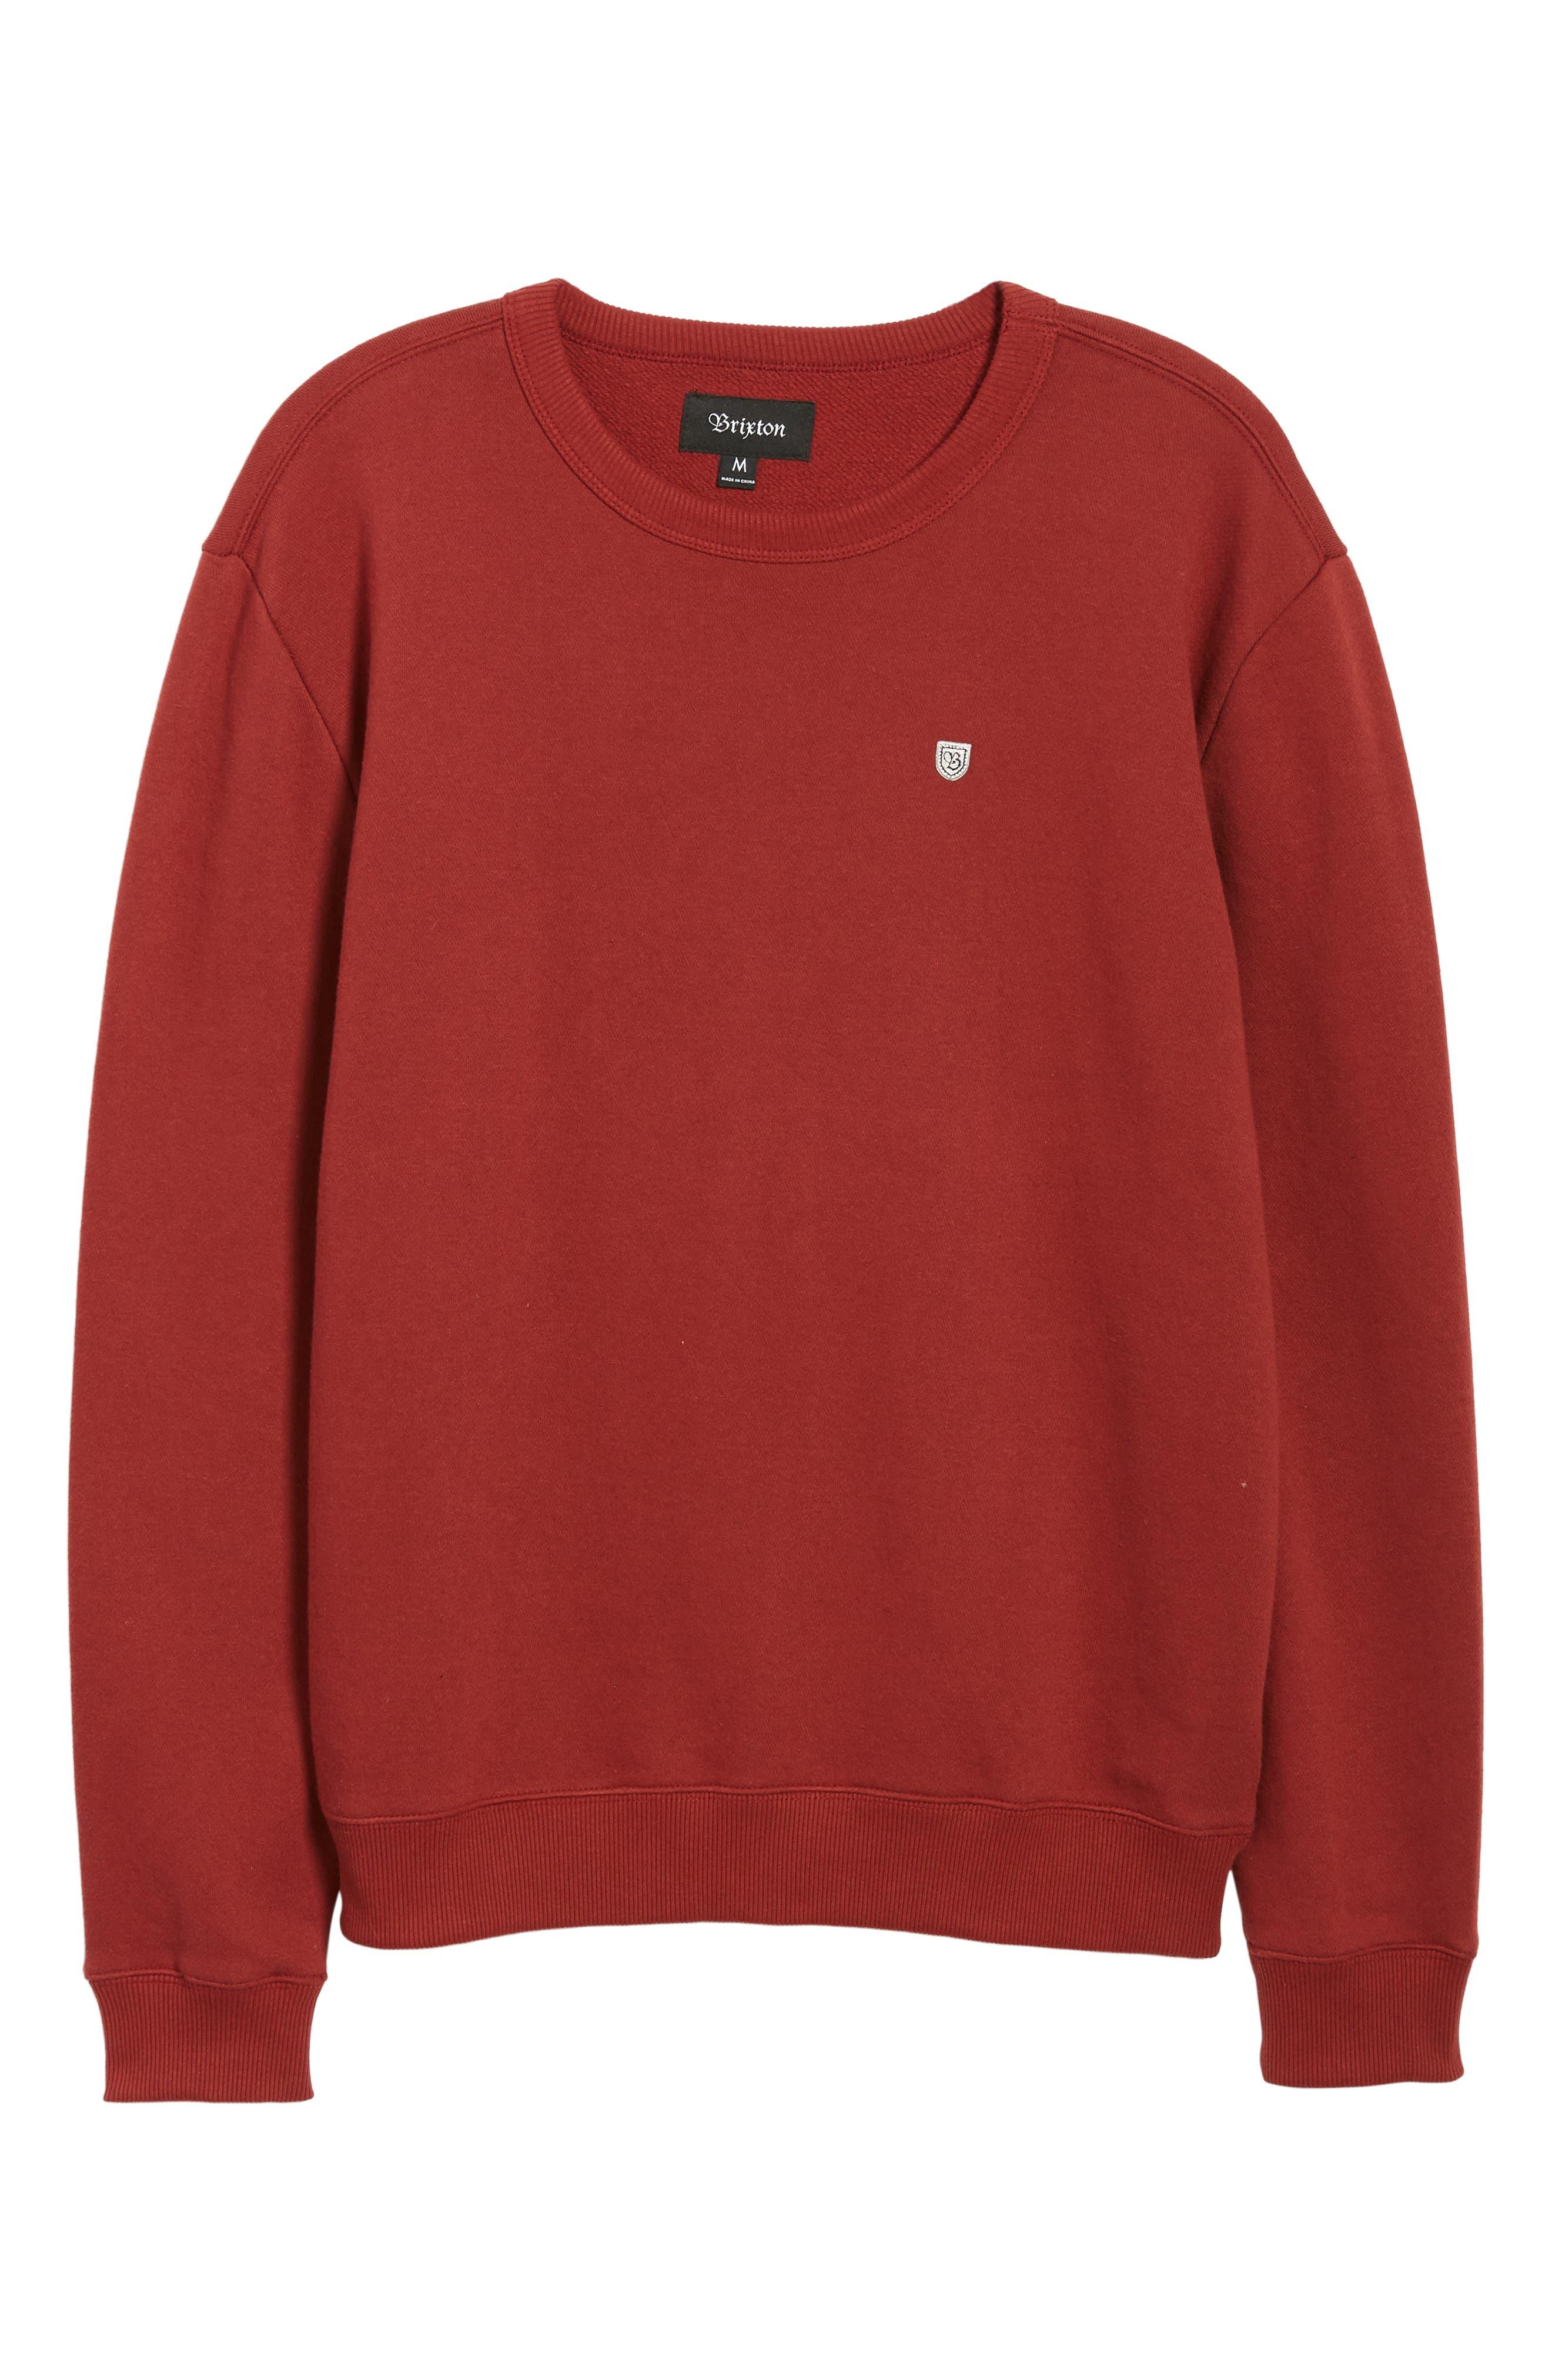 B-Shield Appliqué Crewneck Sweatshirt,                             Alternate thumbnail 6, color,                             RED